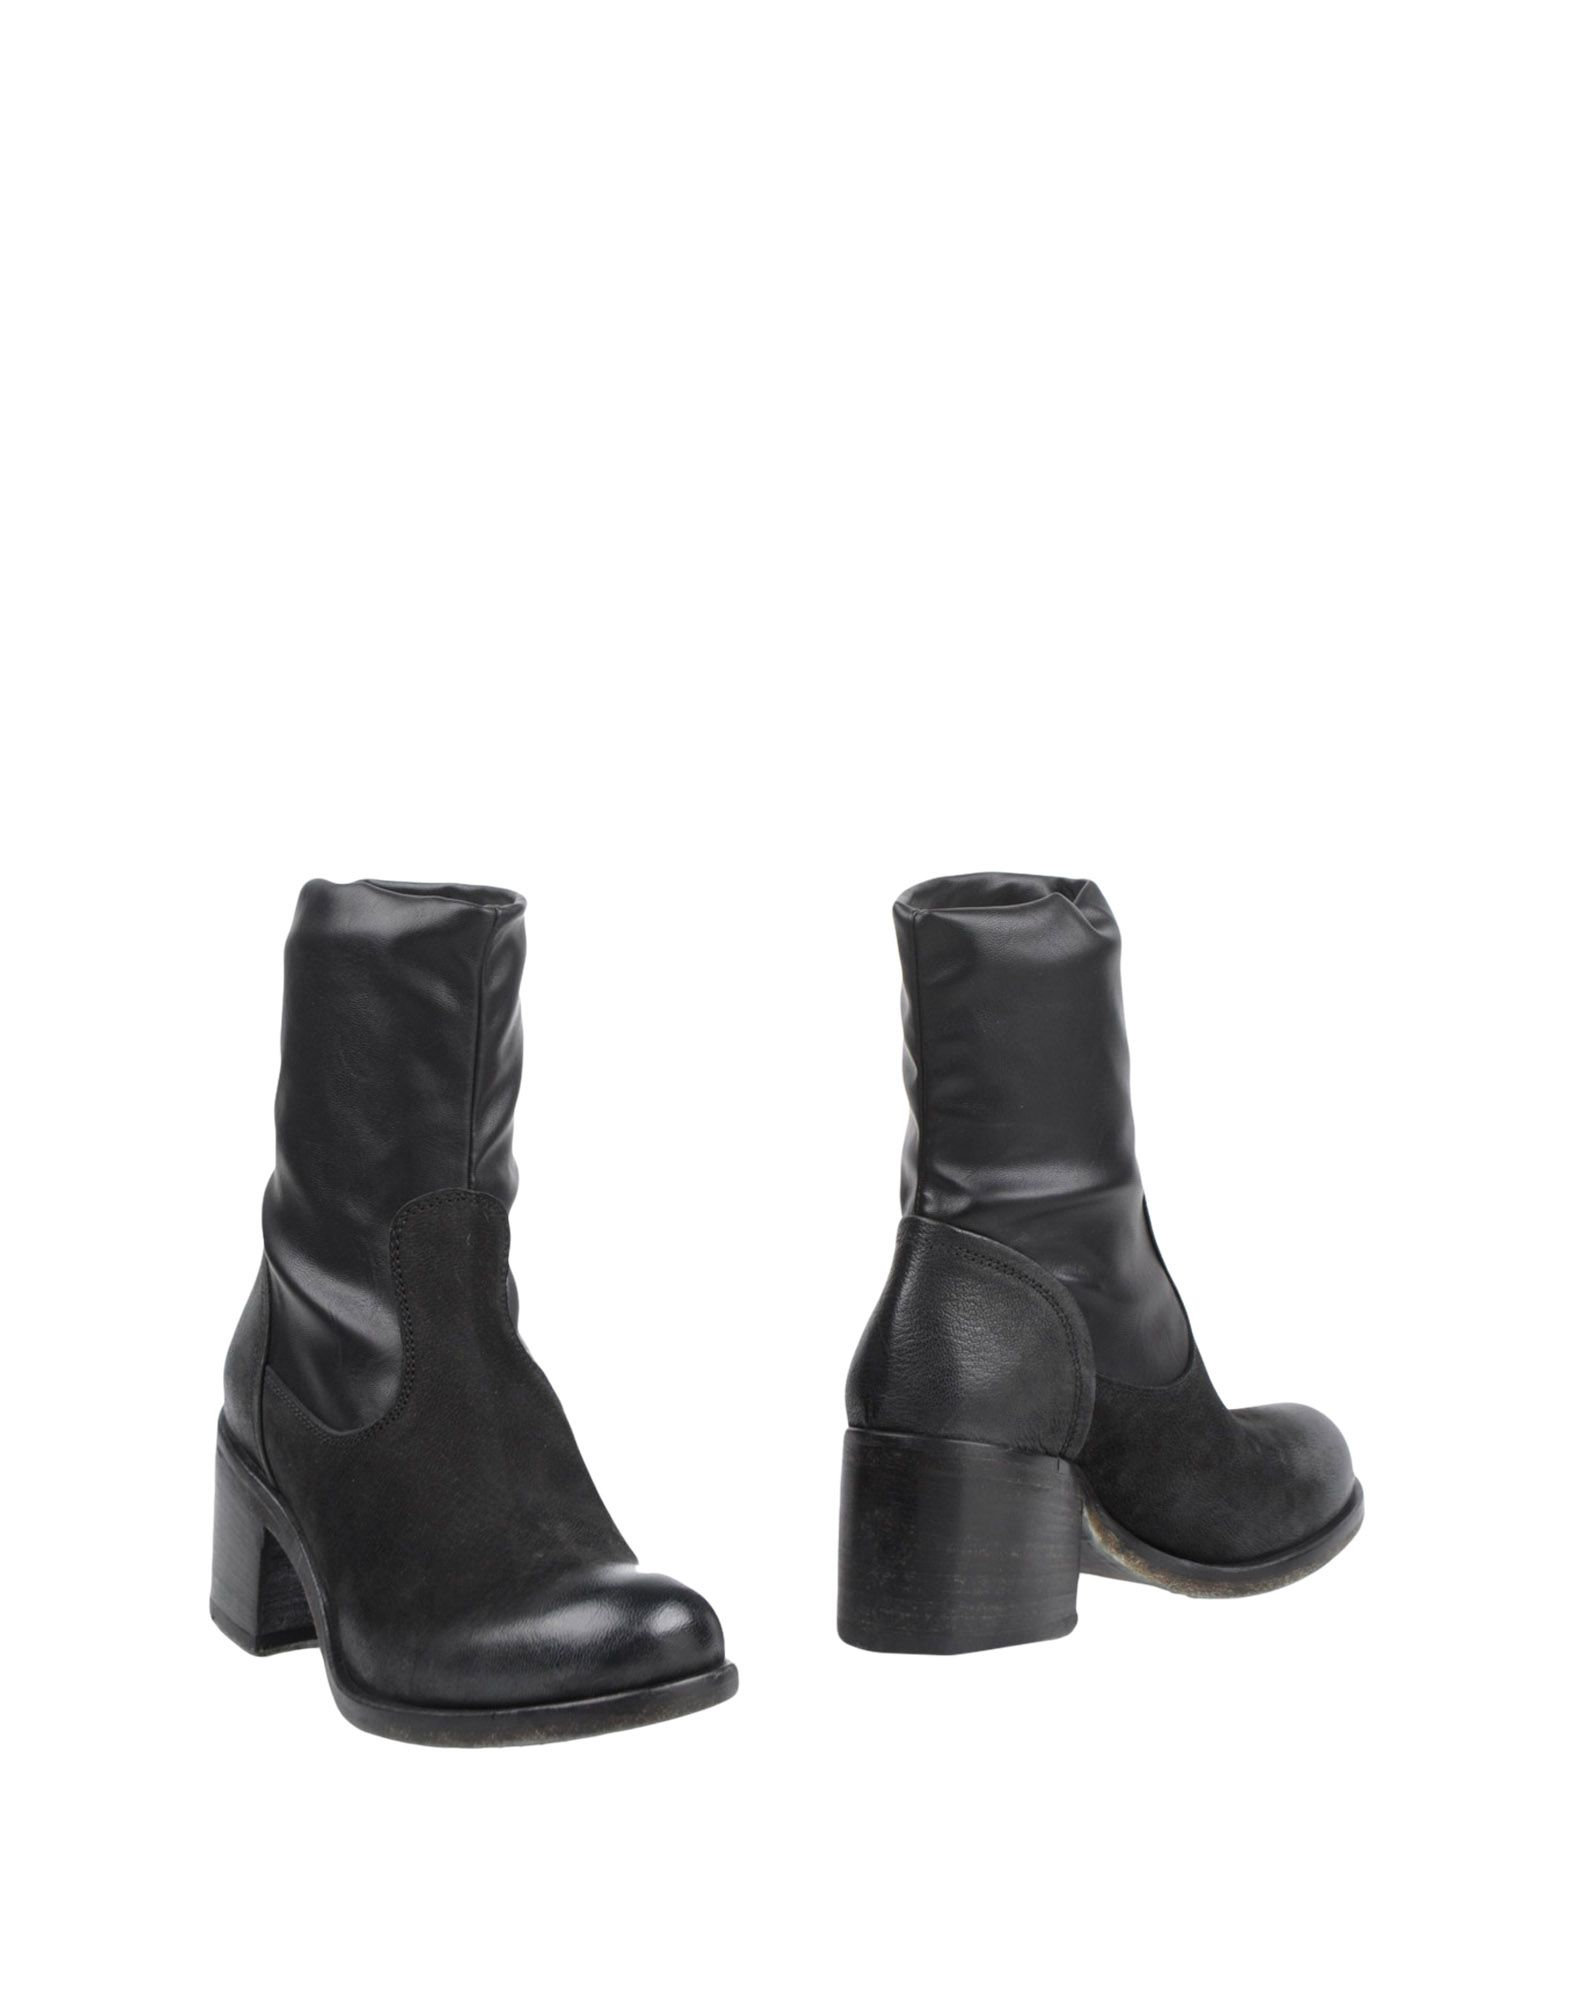 neri karra 1710 33 1 11 02 ELISABETTA NERI Полусапоги и высокие ботинки